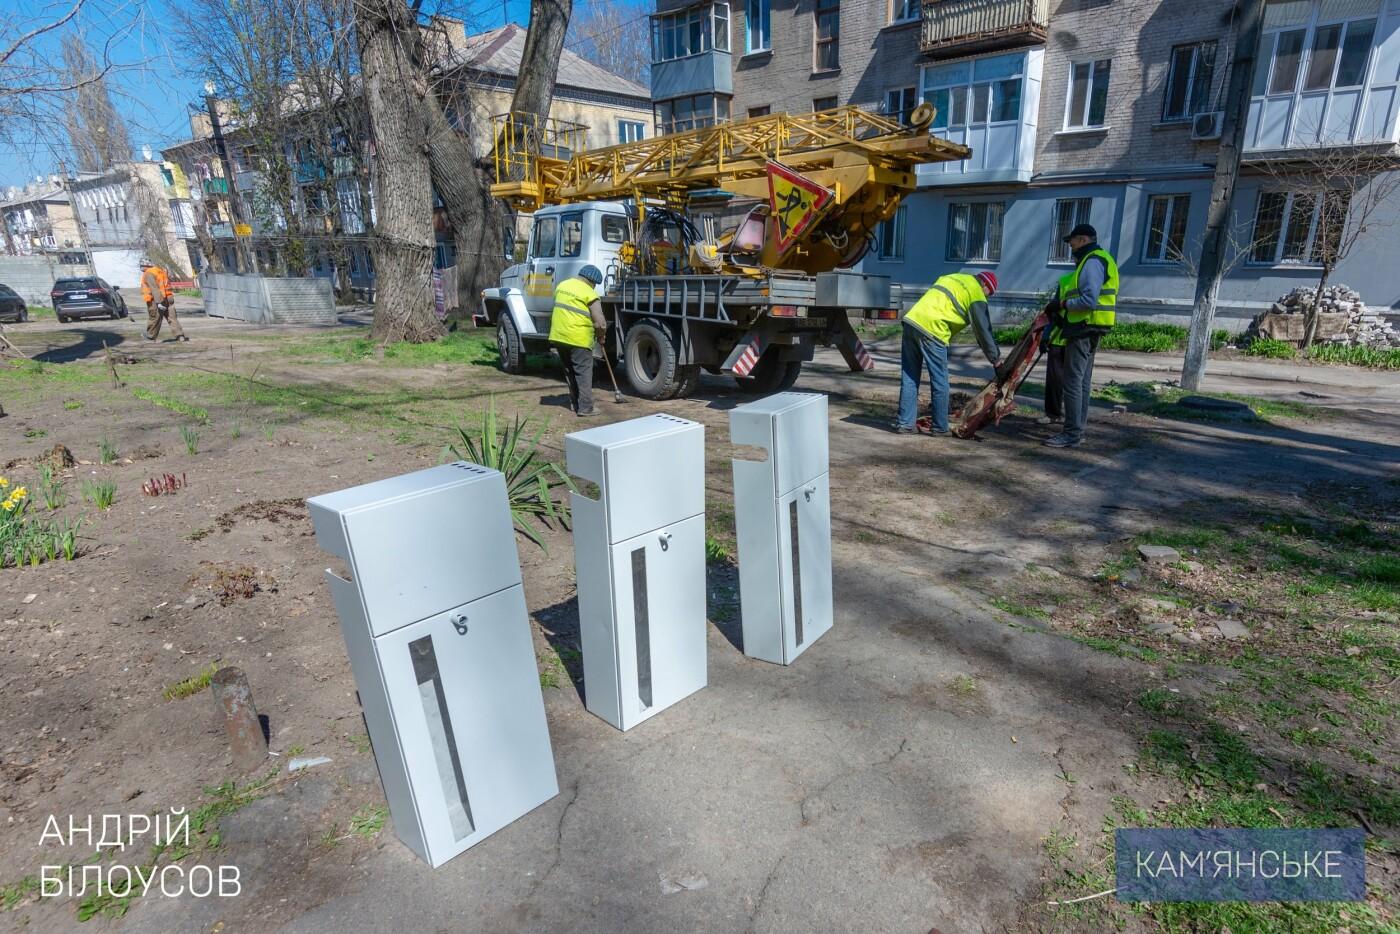 Каменчанам Соцгорода и БАМа модернизируют электрические сети, фото-4